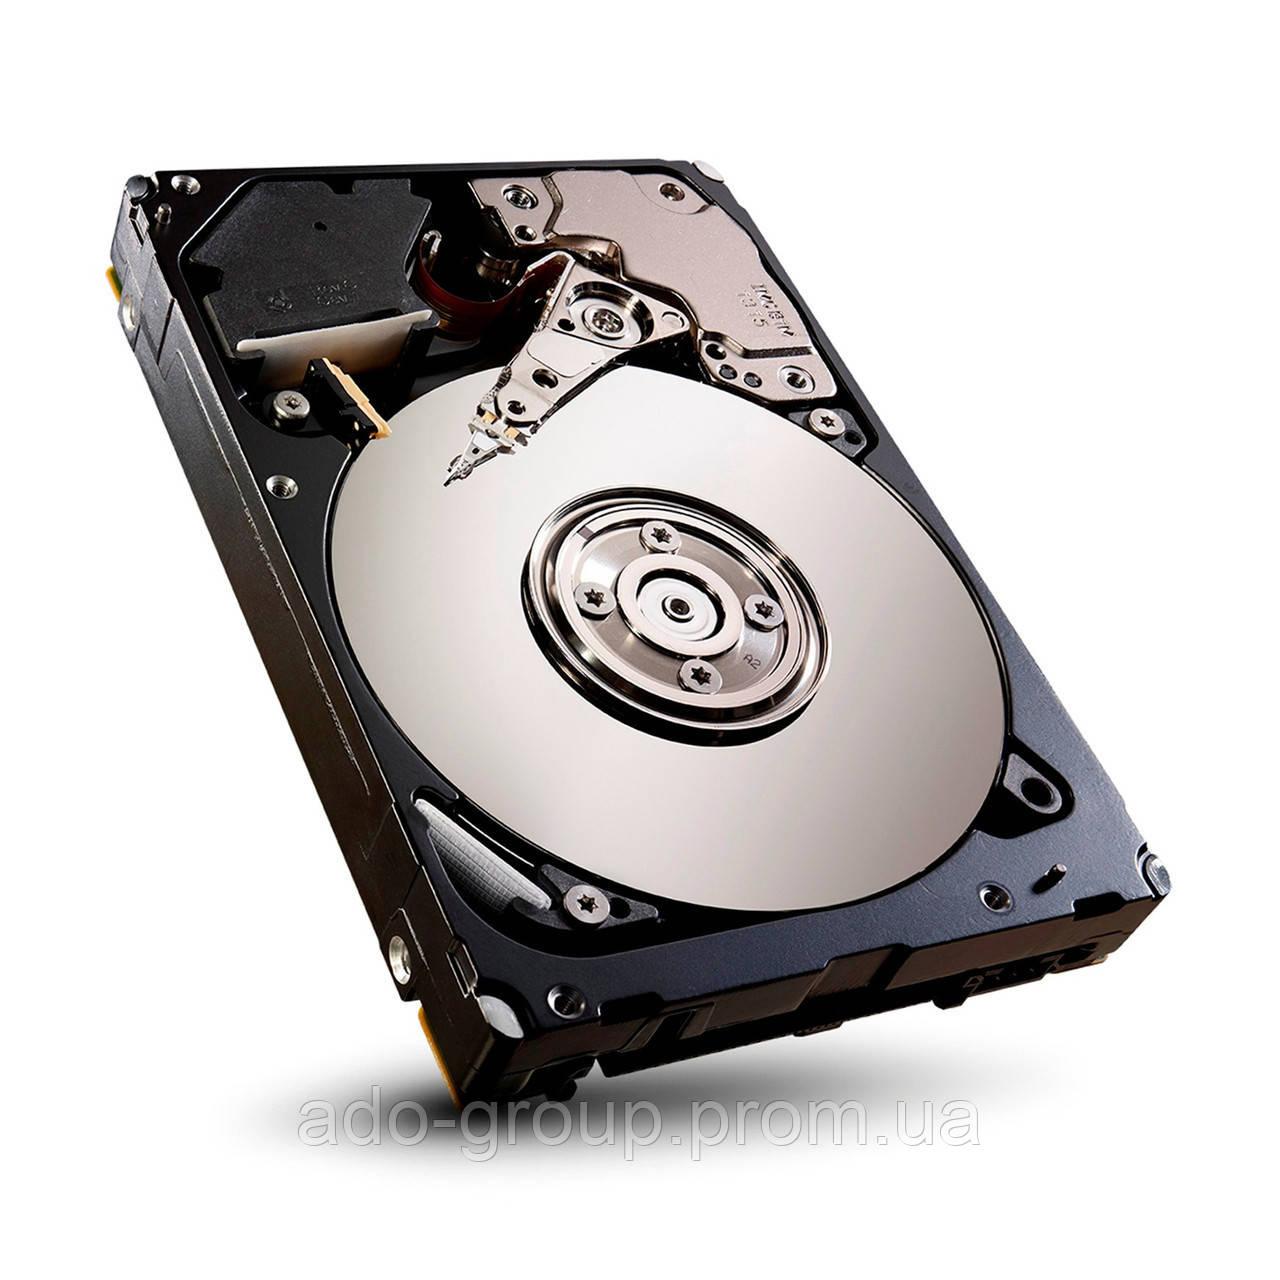 "ST3500630NS Жесткий диск HP 500GB SATA 7.2K  3.5"" +"